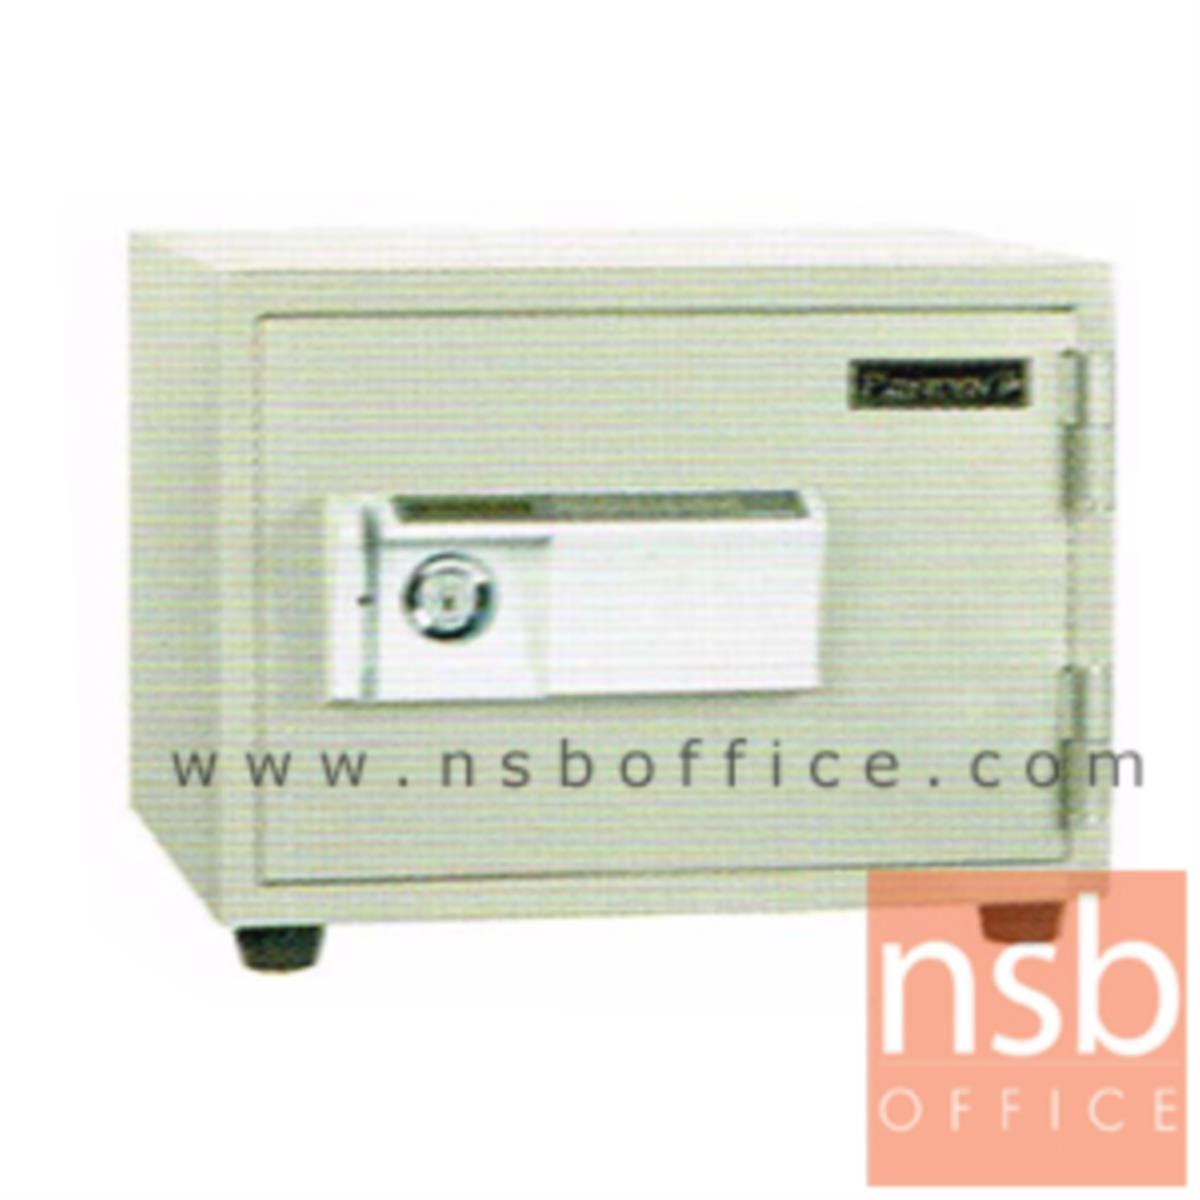 F05A054:ตู้เซฟดิจิตอล 50 กก. แนวนอน รุ่น PRESIDENT-SS1D2 มี 1 กุญแจ 1 รหัส (รหัสใช้กดห